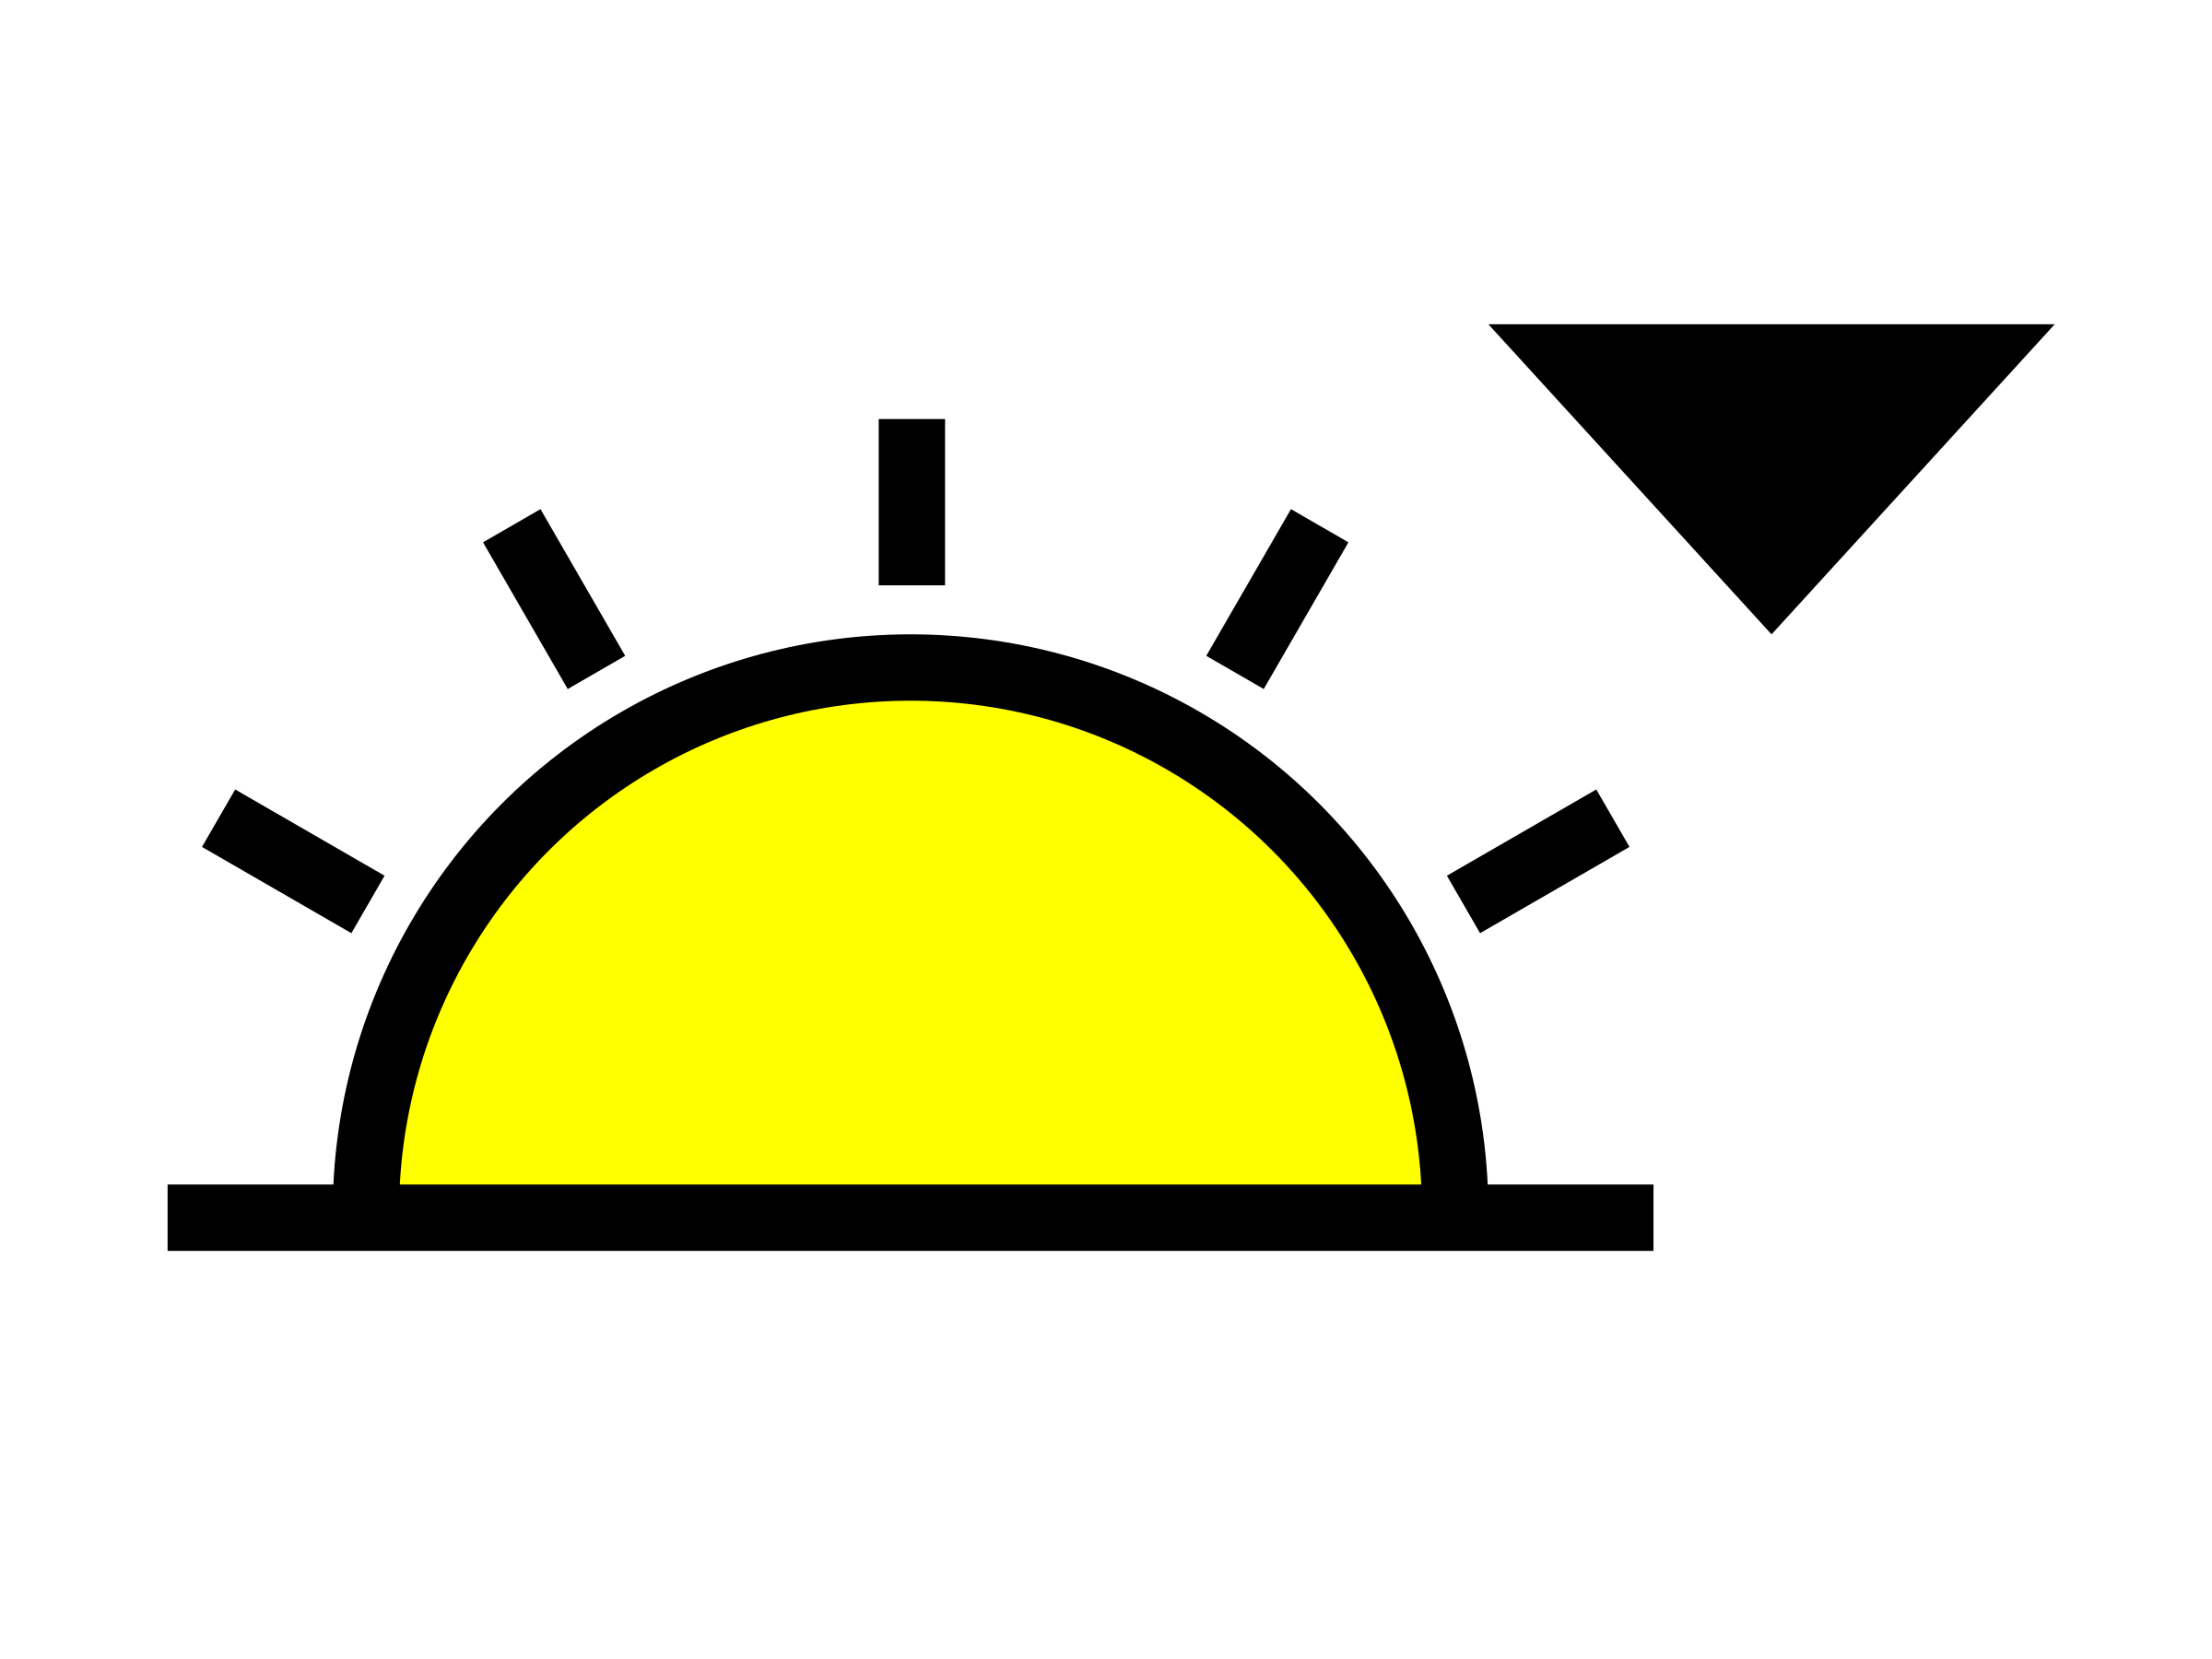 Symbol. Sunset clipart sun set